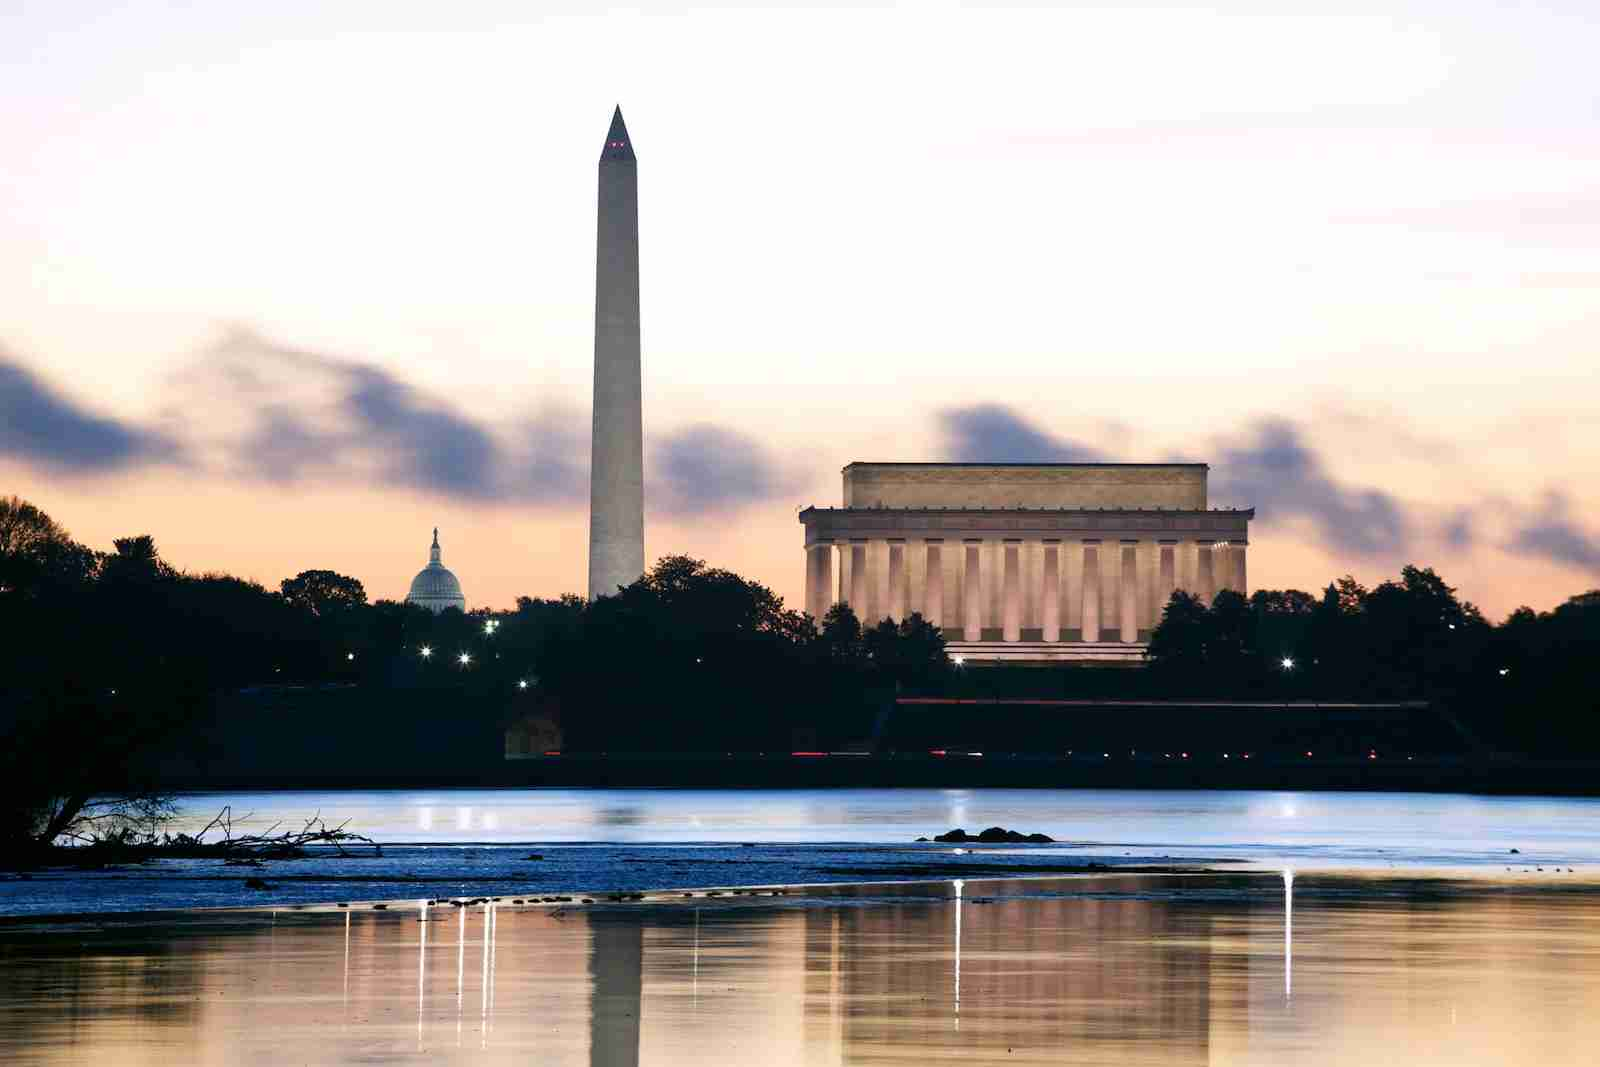 Lincoln Memorial, Washington Monument, Capital Sunrise